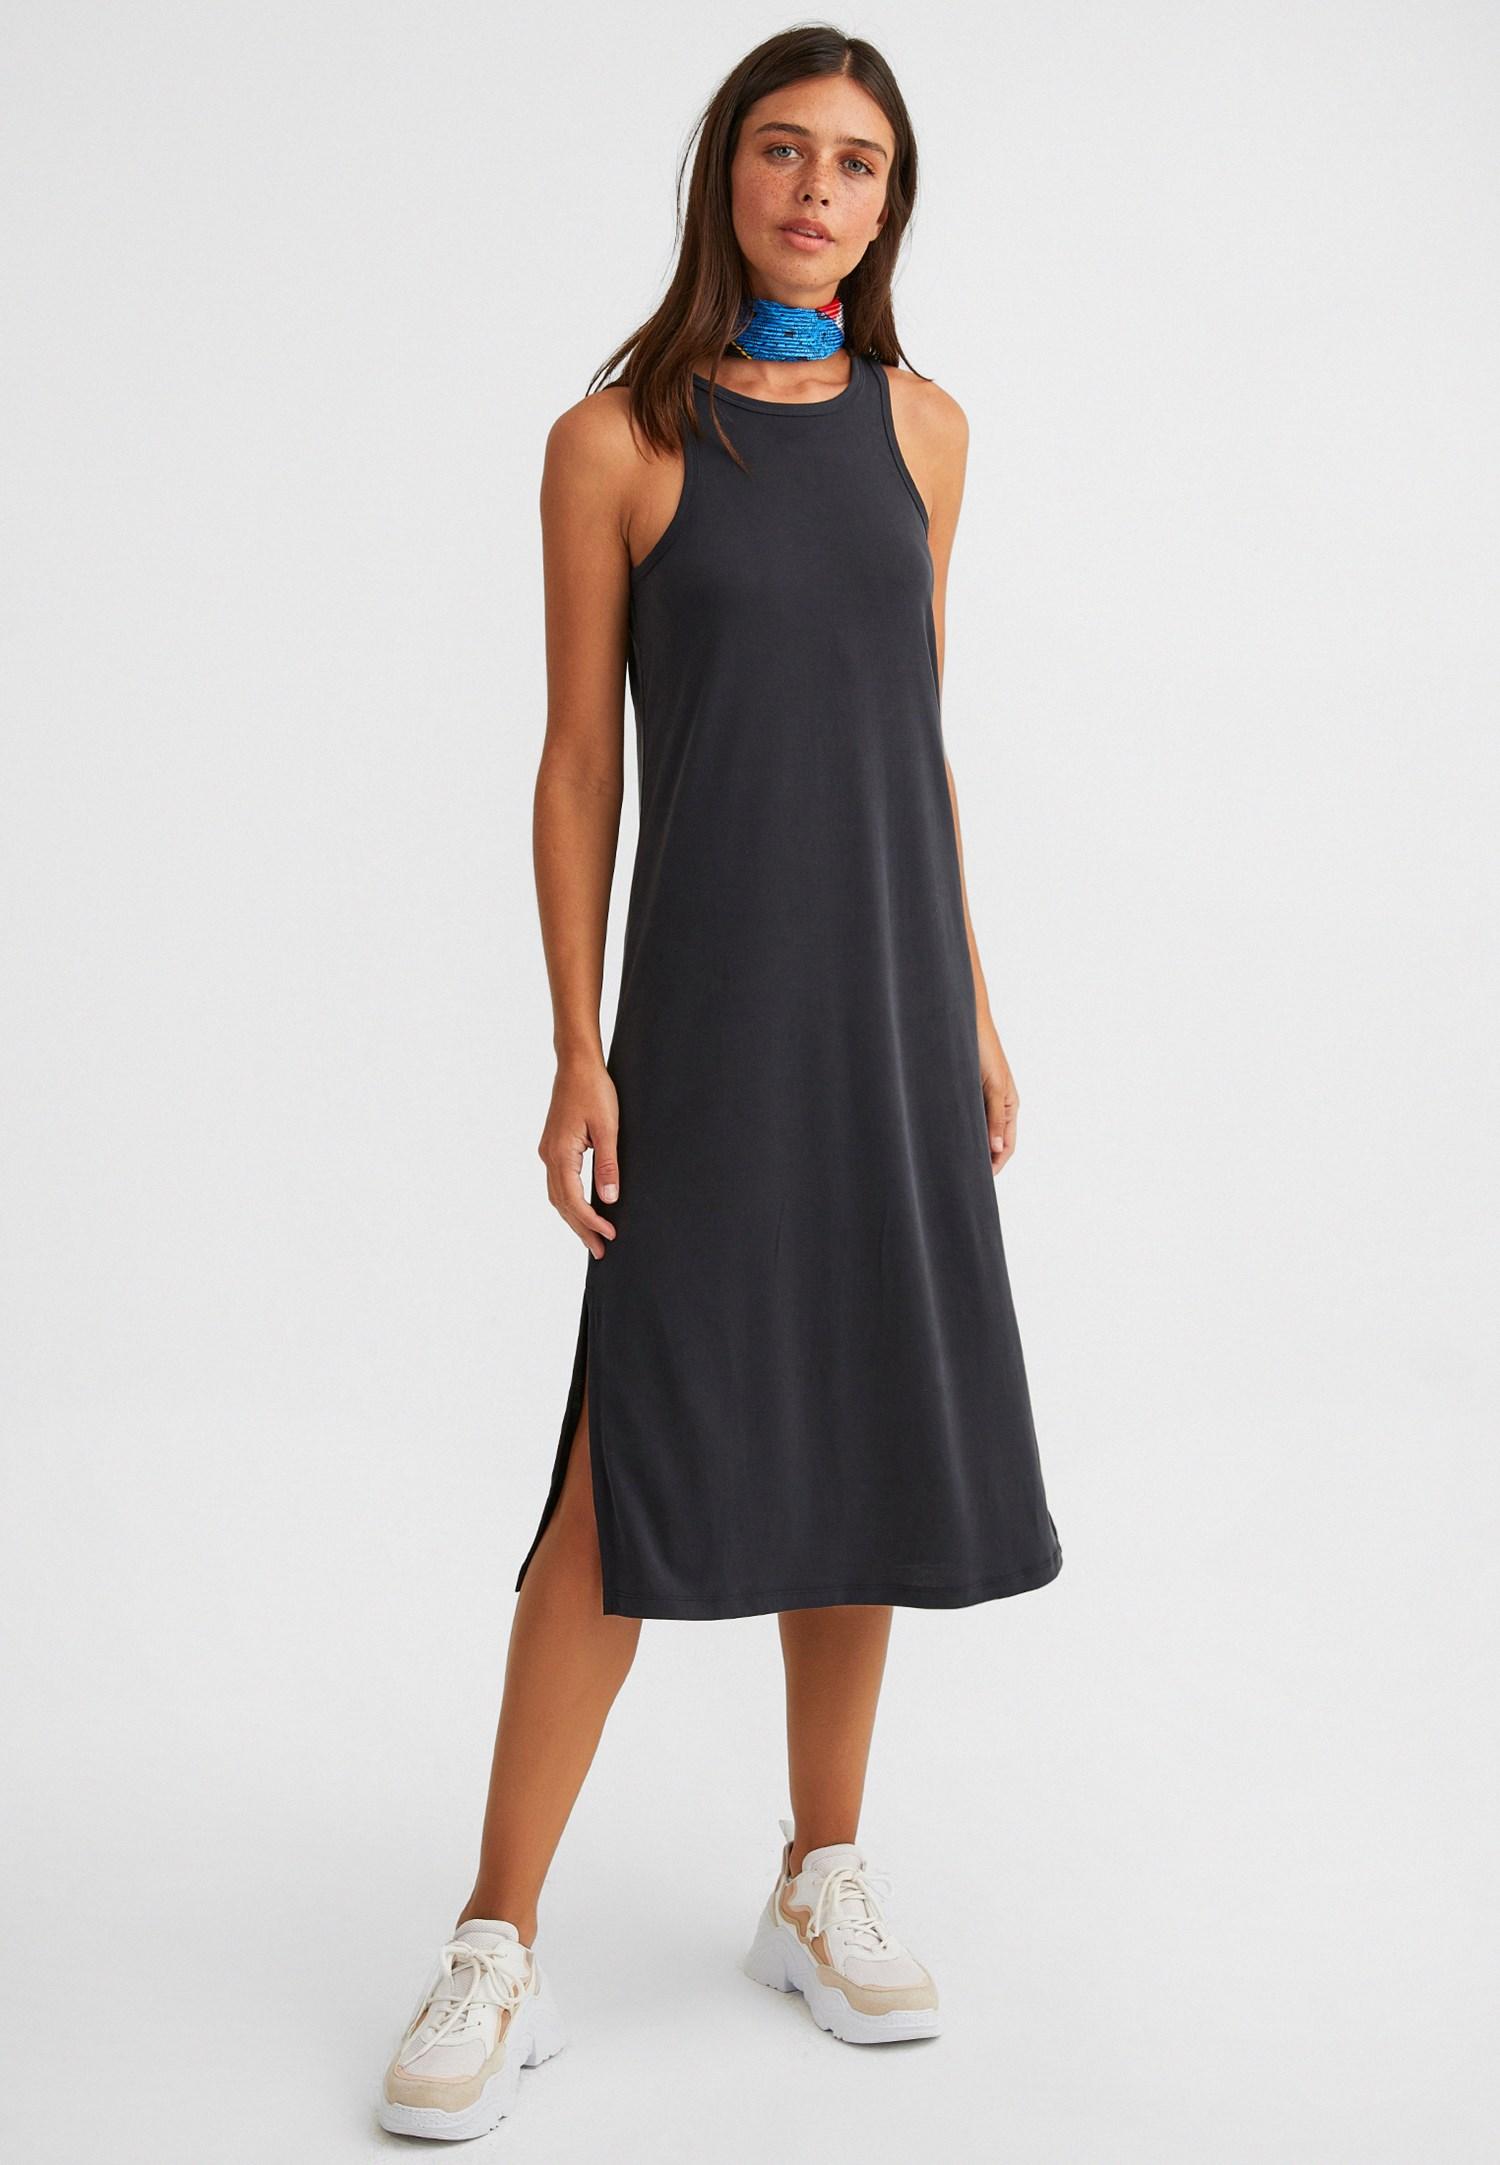 Bayan Siyah Yumuşak Dokulu Halter Yaka Elbise